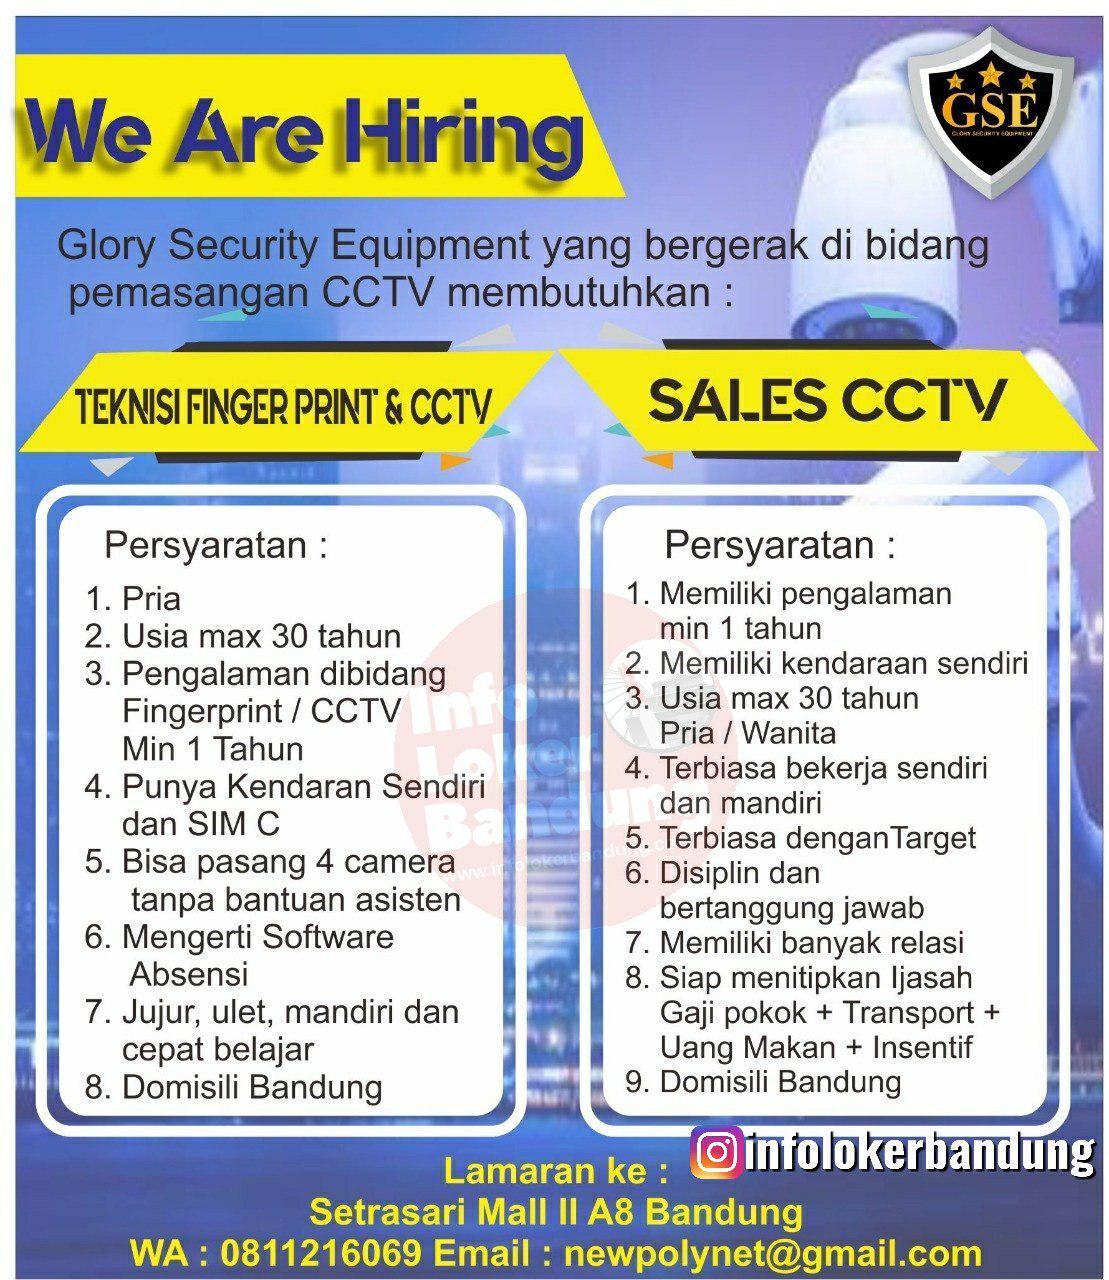 Lowongan Kerja Glory Security Equitment (GSE) Bandung Oktober 2019